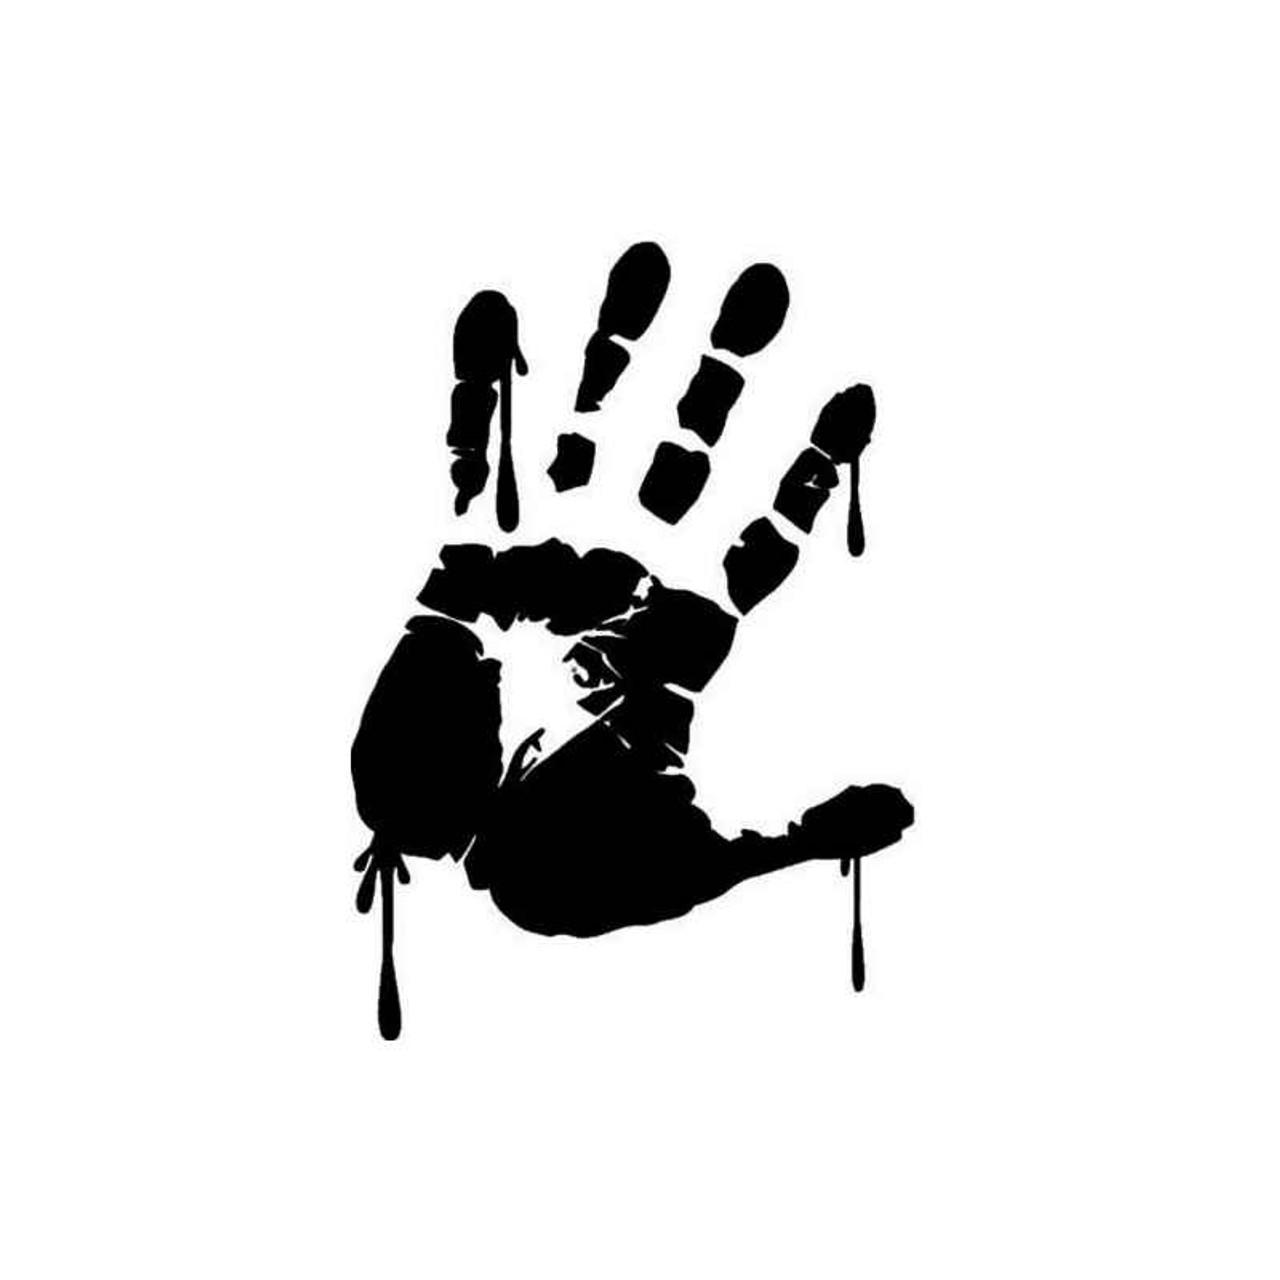 Vinyl Decal Truck Car Sticker Laptop Horror Movies Zombie Bloody Handprint